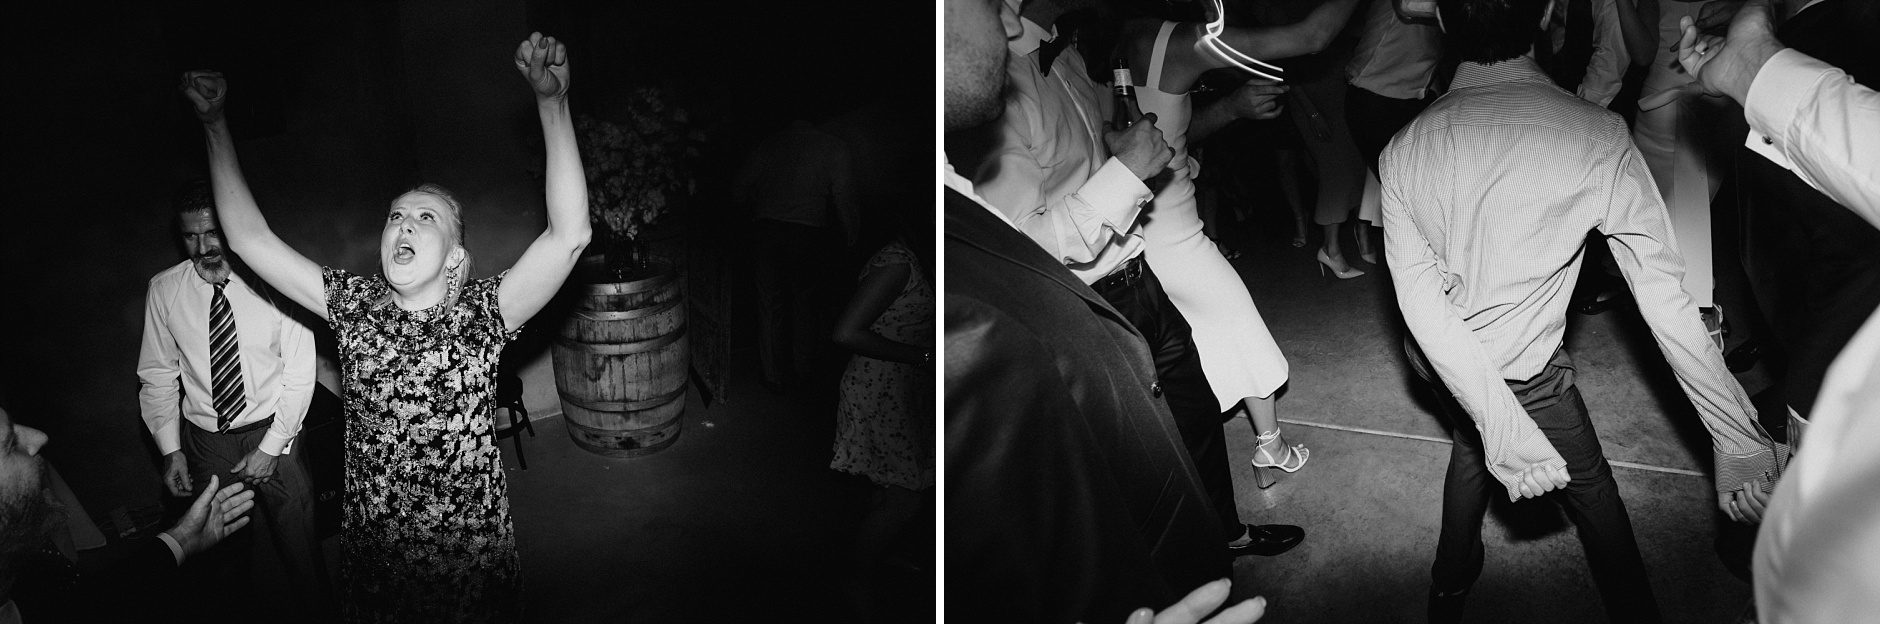 cassandra&cameron1315ab_Peppers-Creek-Wedding.jpg